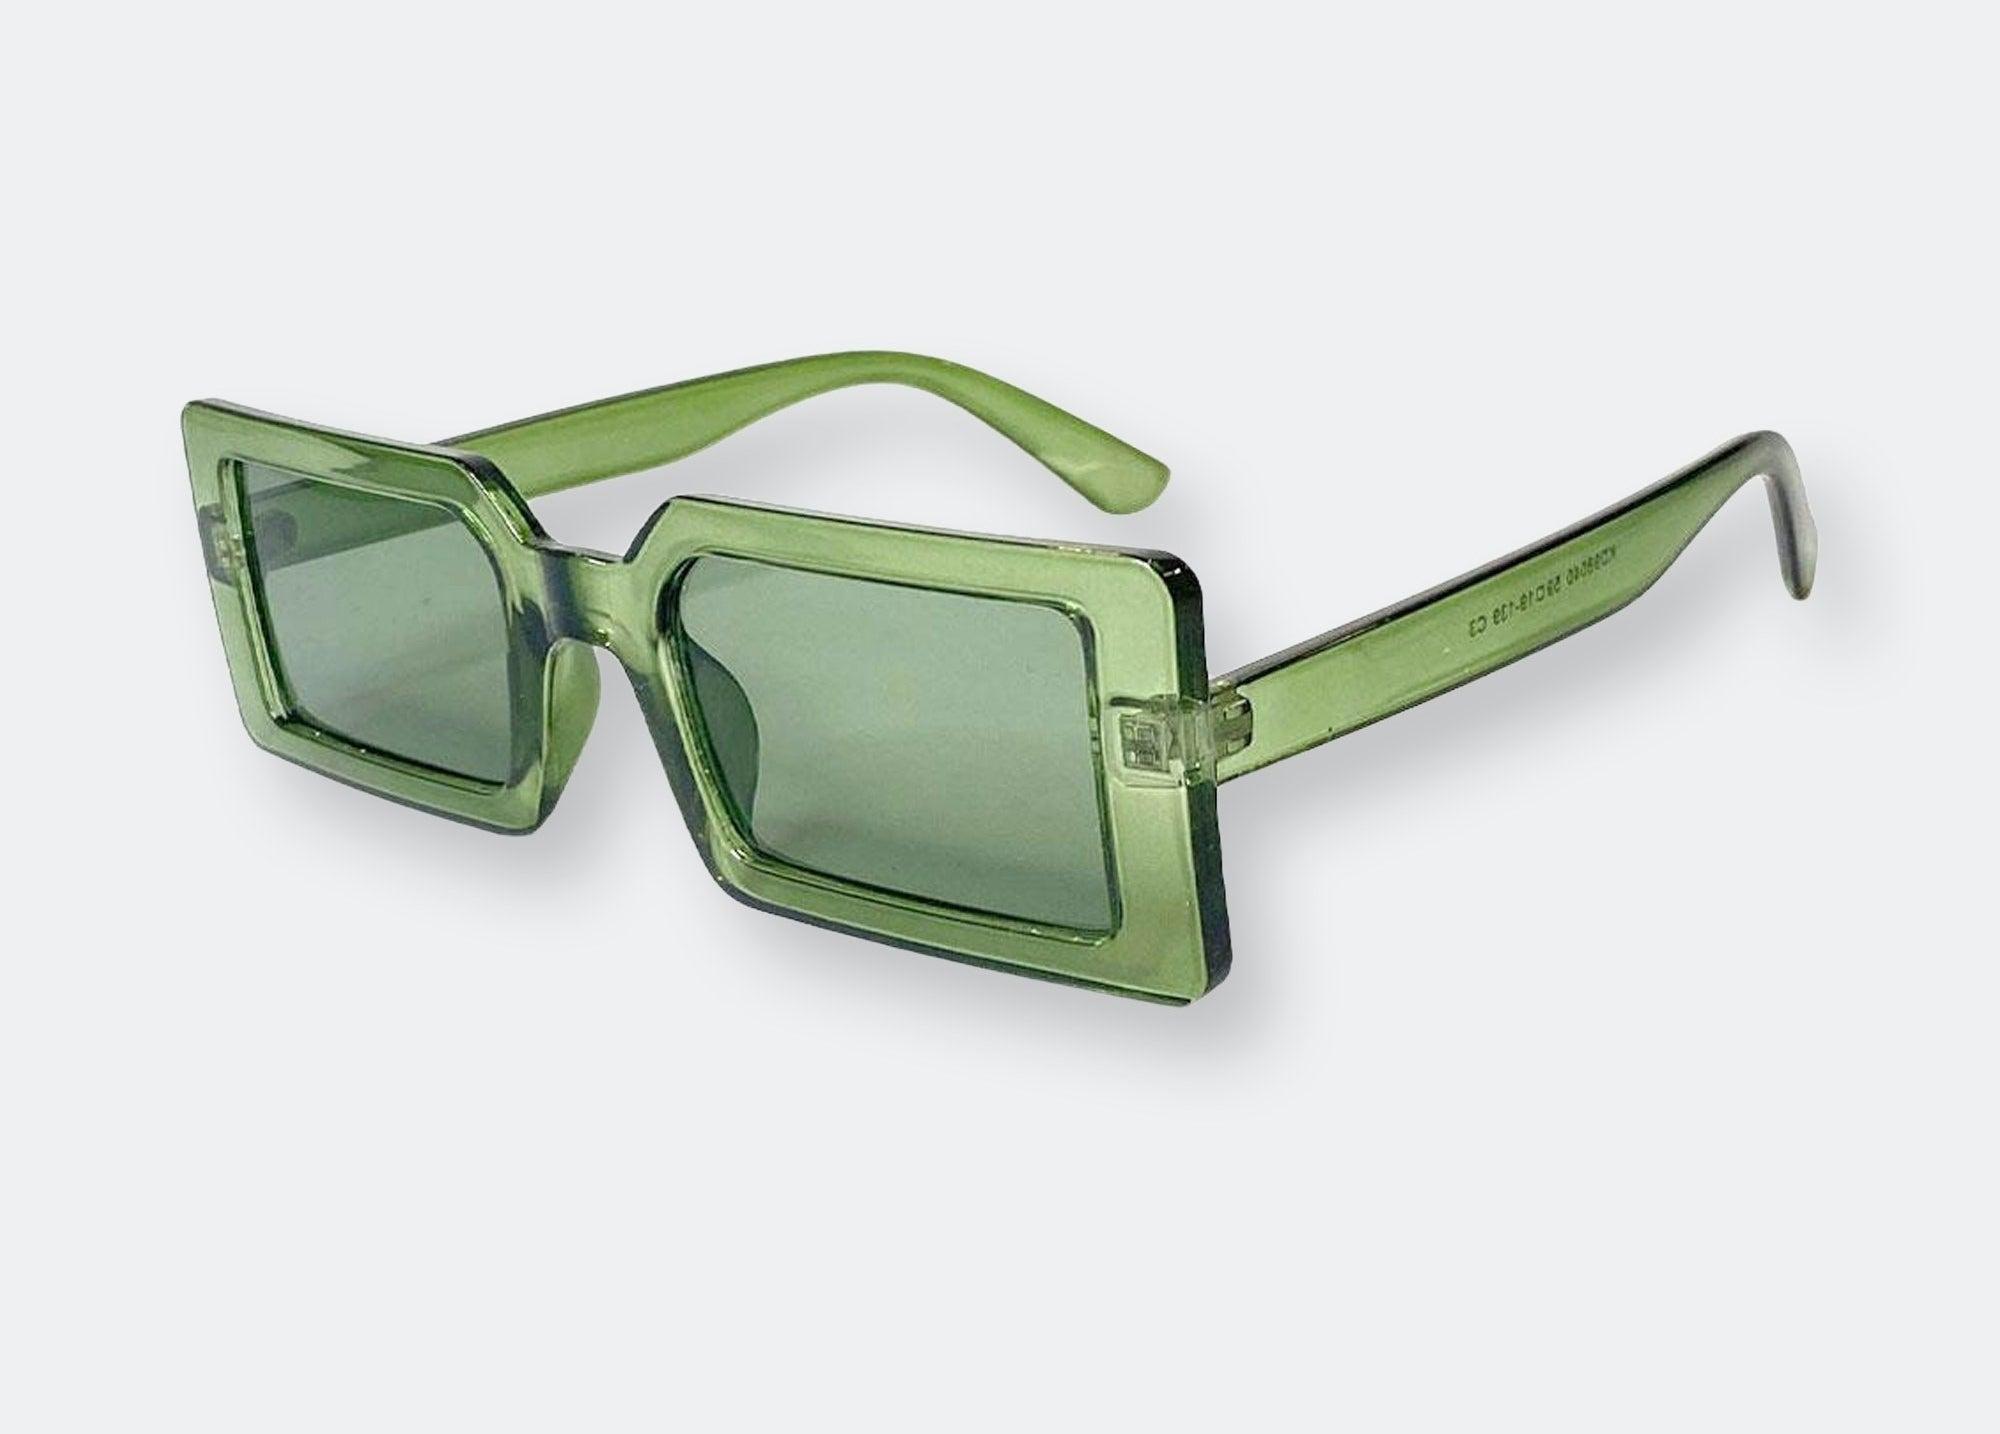 a pair of green rectangular sunglasses